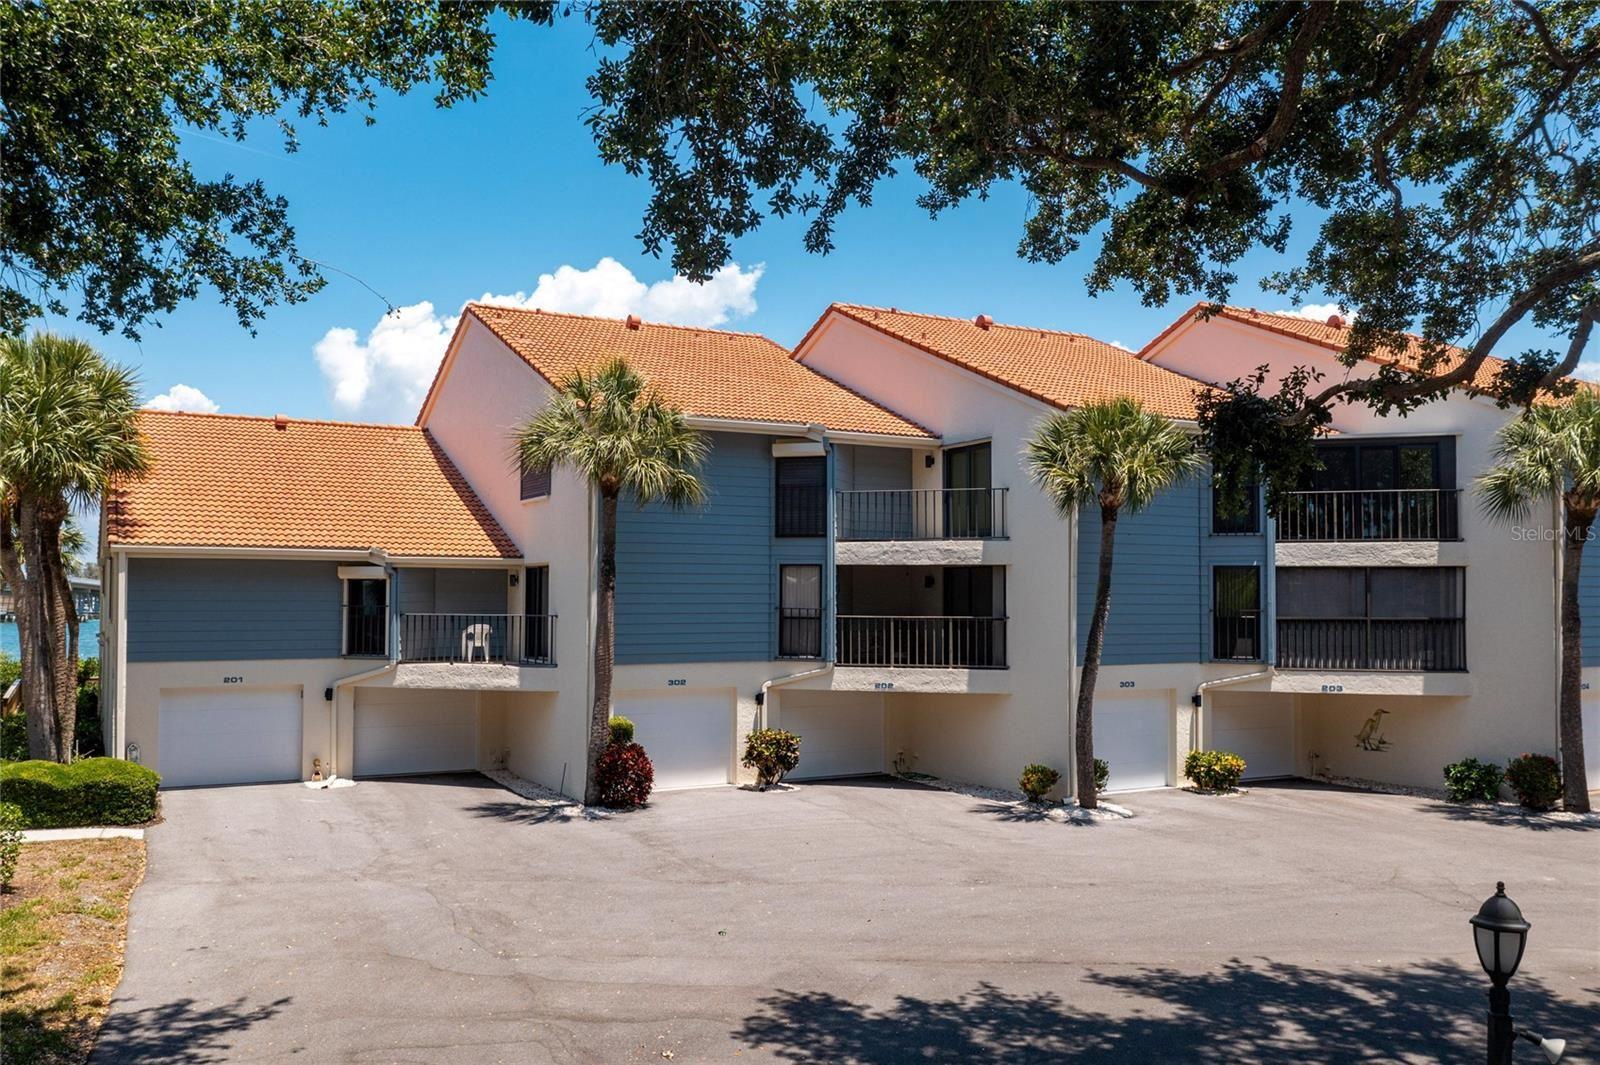 Photo of 1401 BEACH ROAD #201, ENGLEWOOD, FL 34223 (MLS # D6120146)